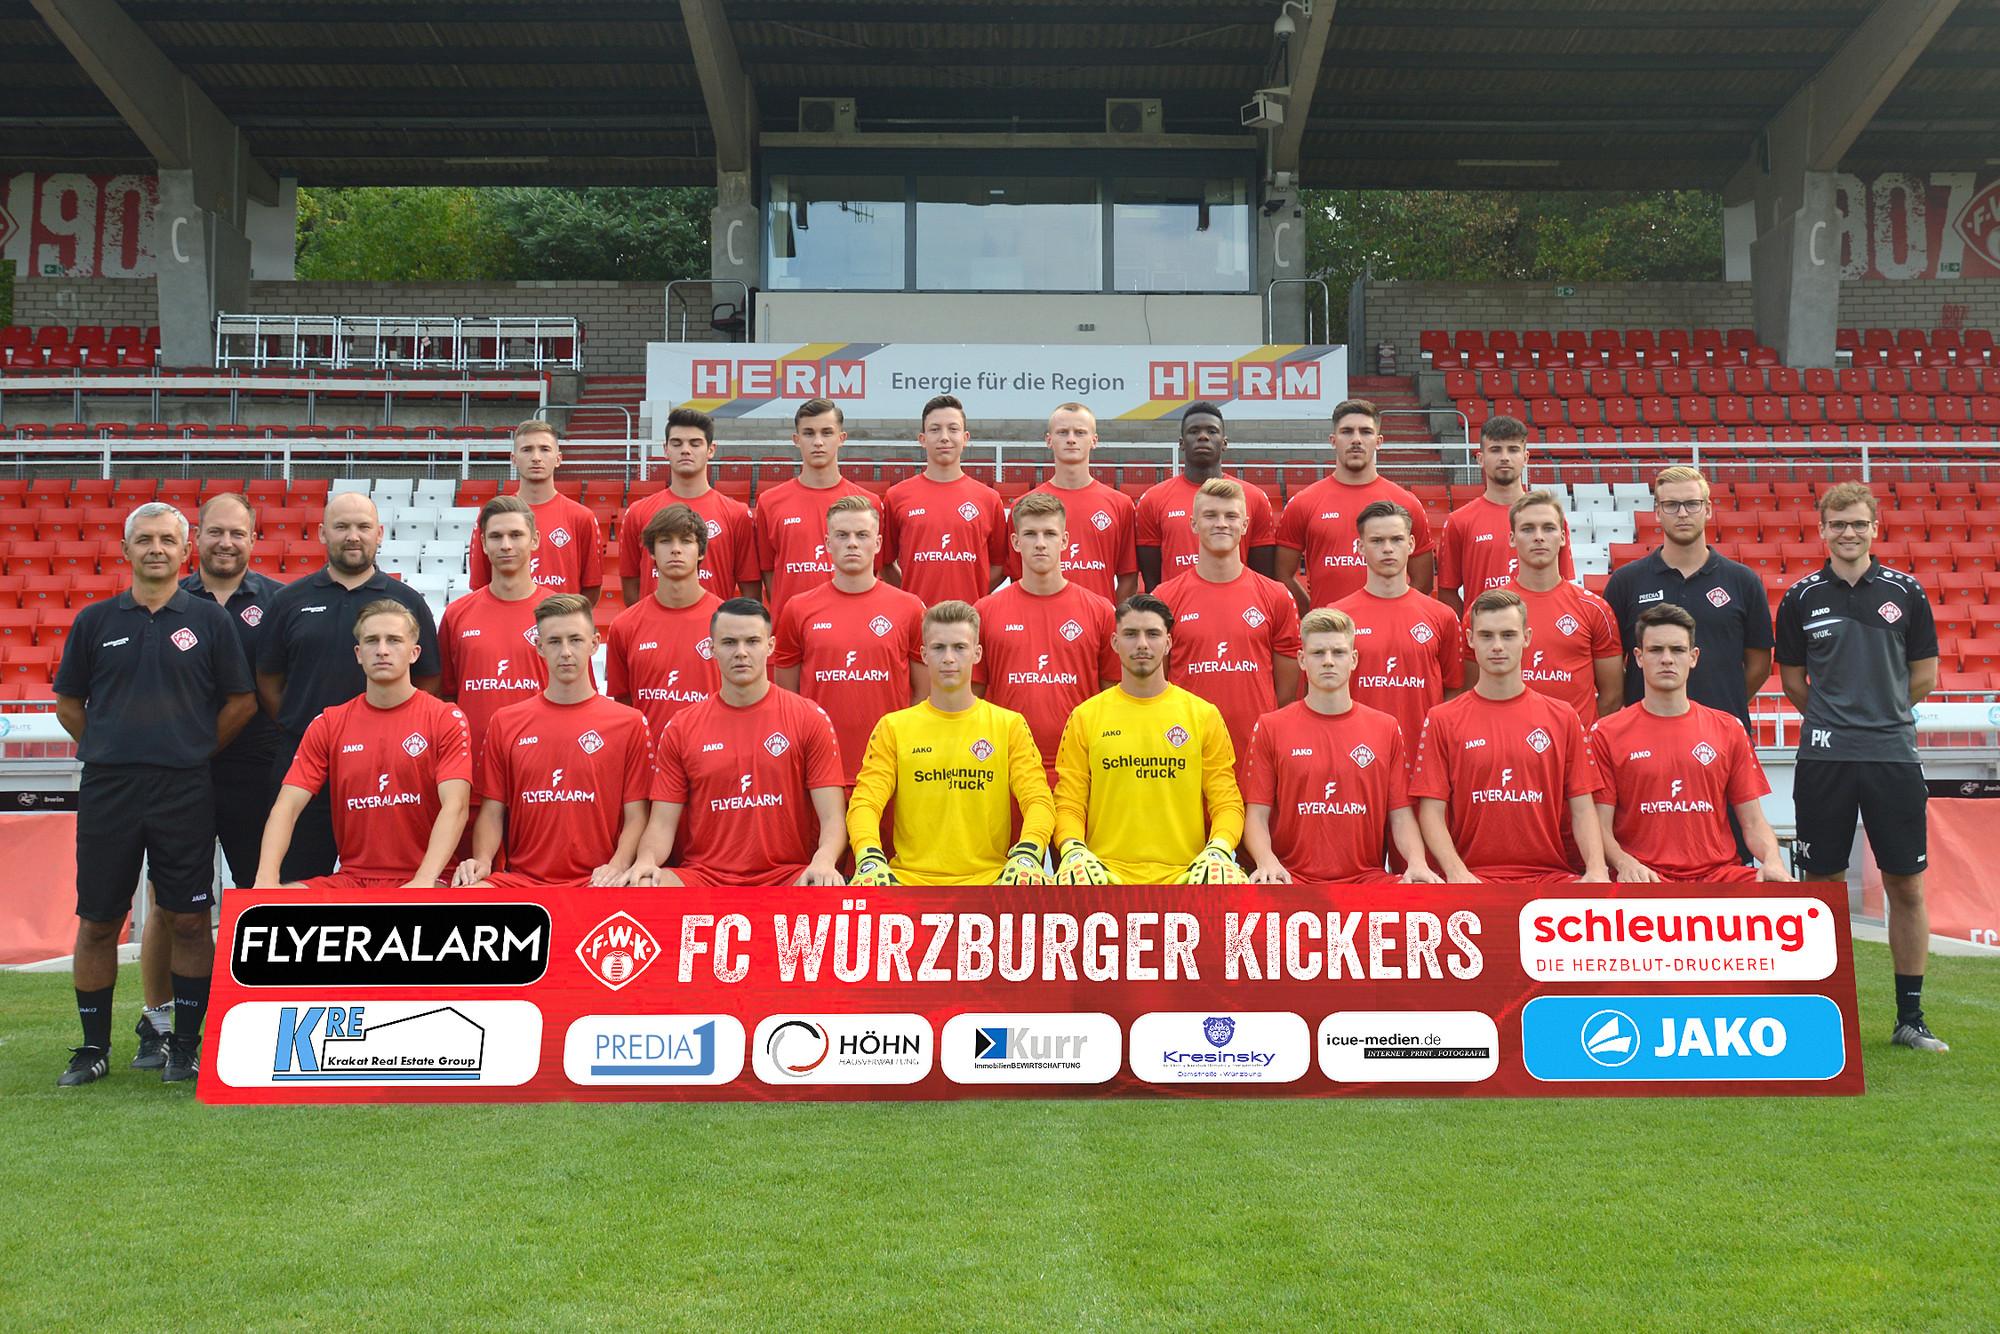 Spiel WГјrzburger Kickers